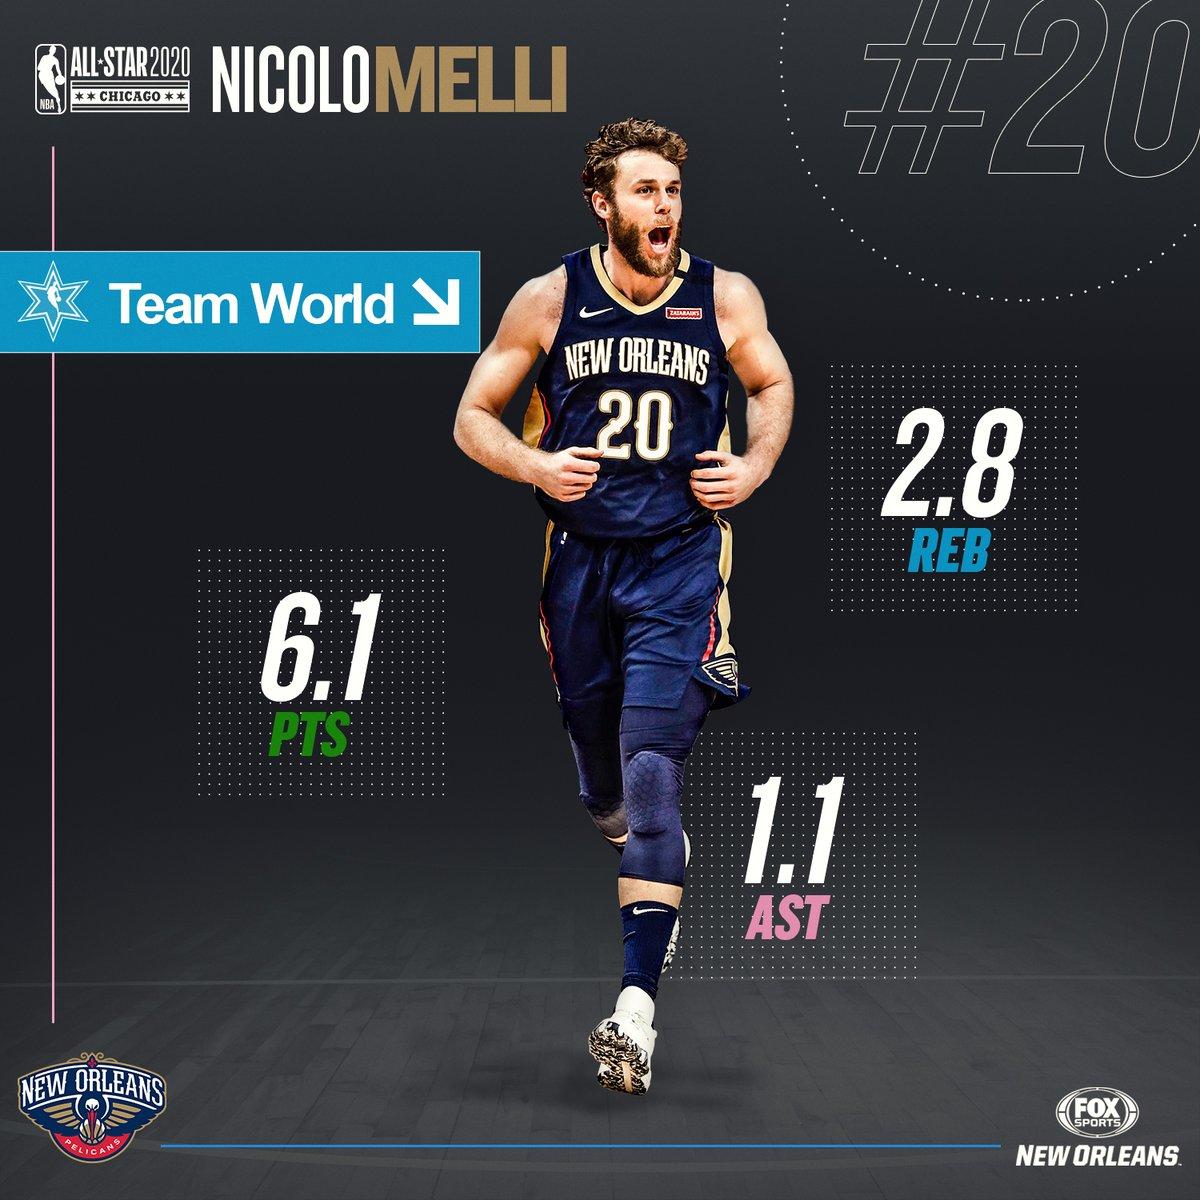 Don't miss @NikMelli and @NickeilAW representing Team World in tonight's #NBARisingStars Challenge in Chicago. #NBAAllStar @PelicansNBA  #WontBowDown